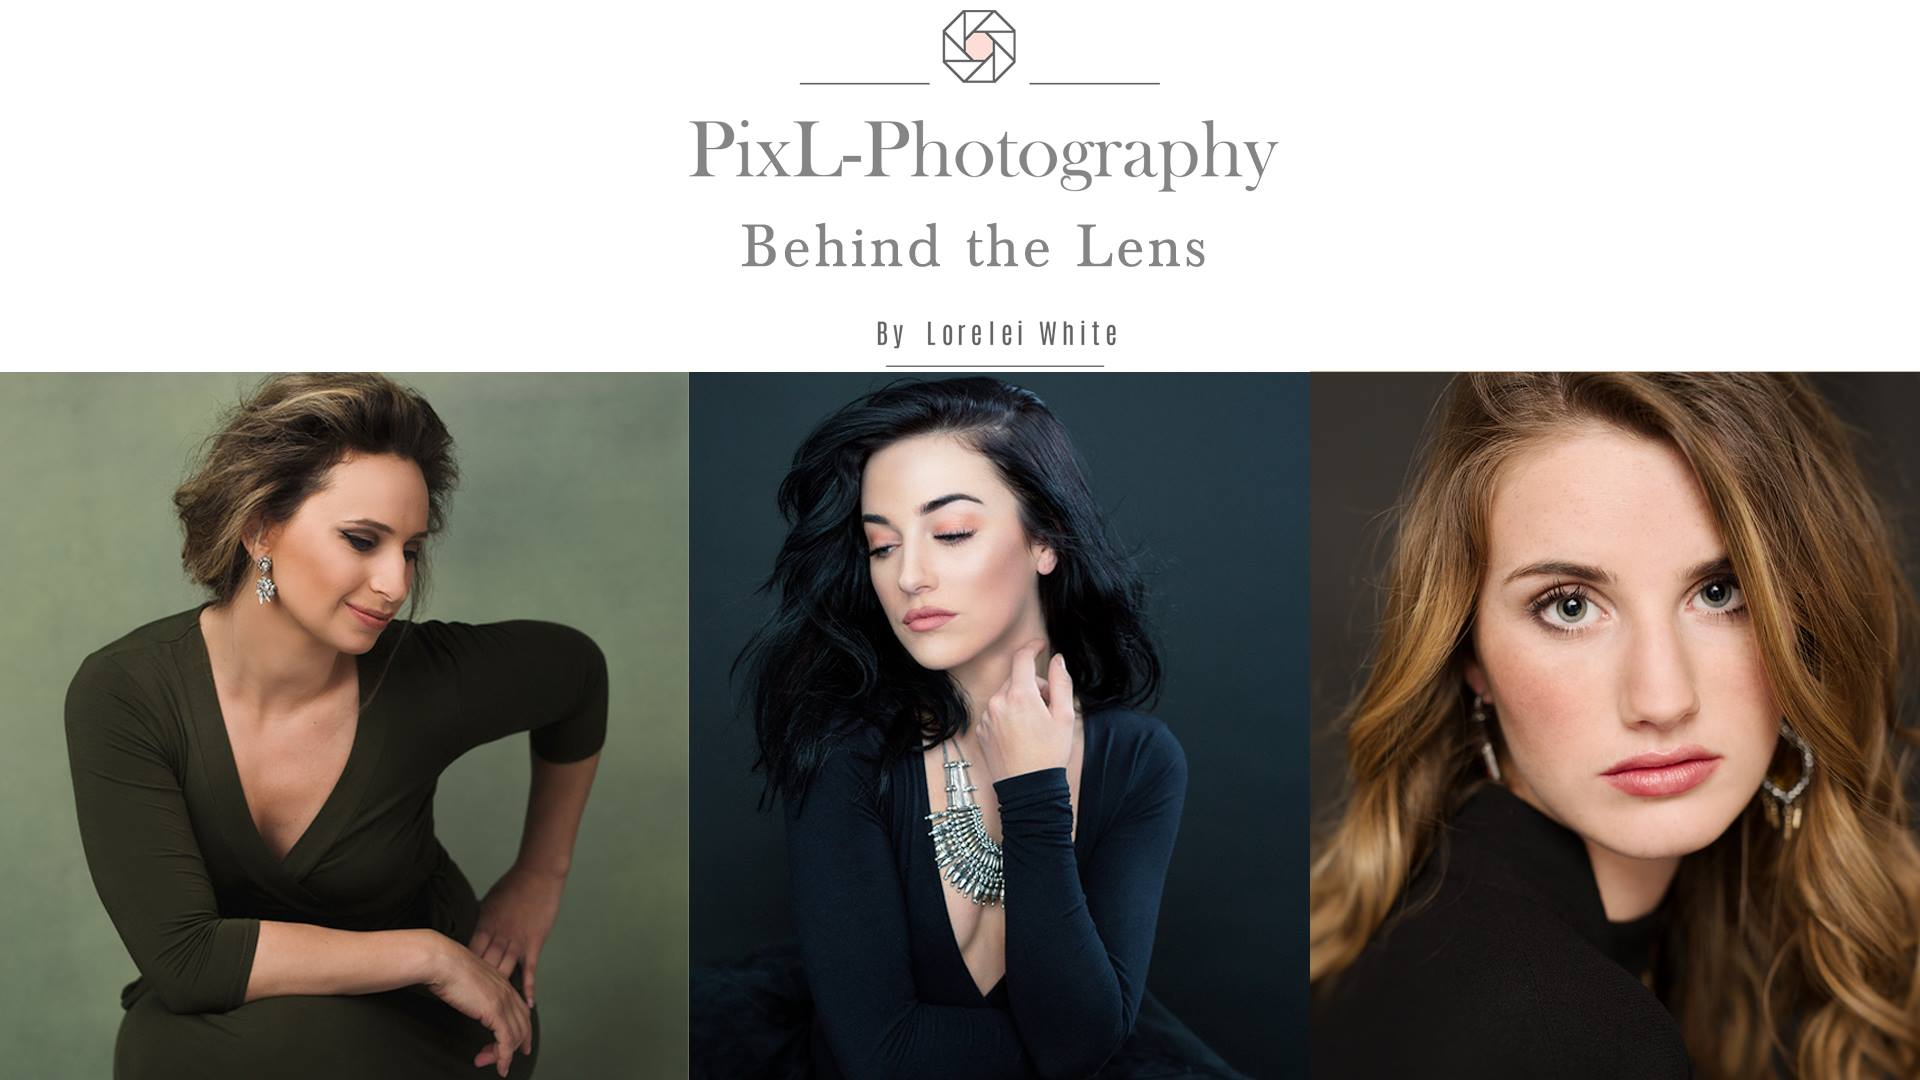 Photo credit: Lorelei White, PixL-Photography